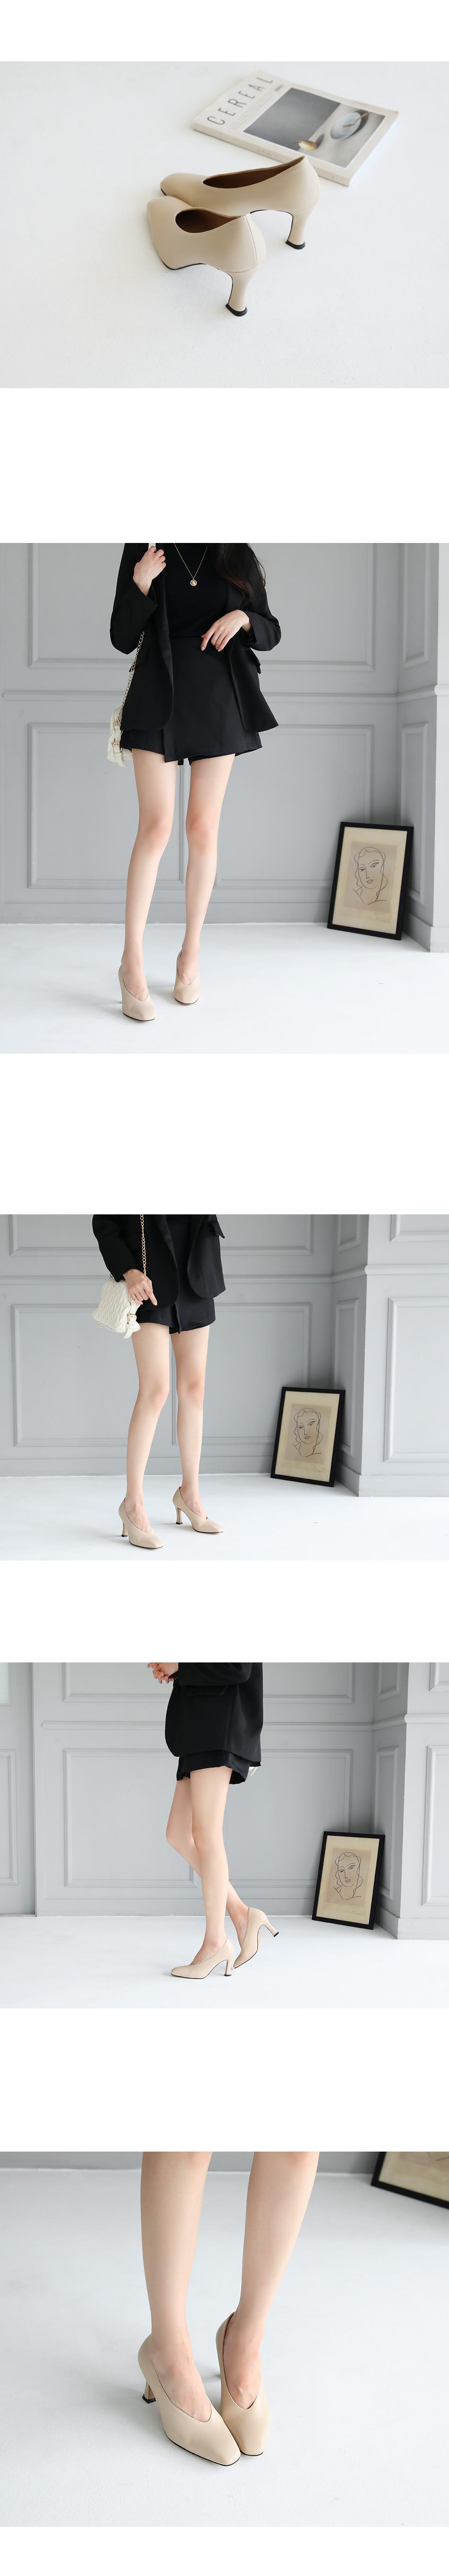 Ceylon High Heels 8cm